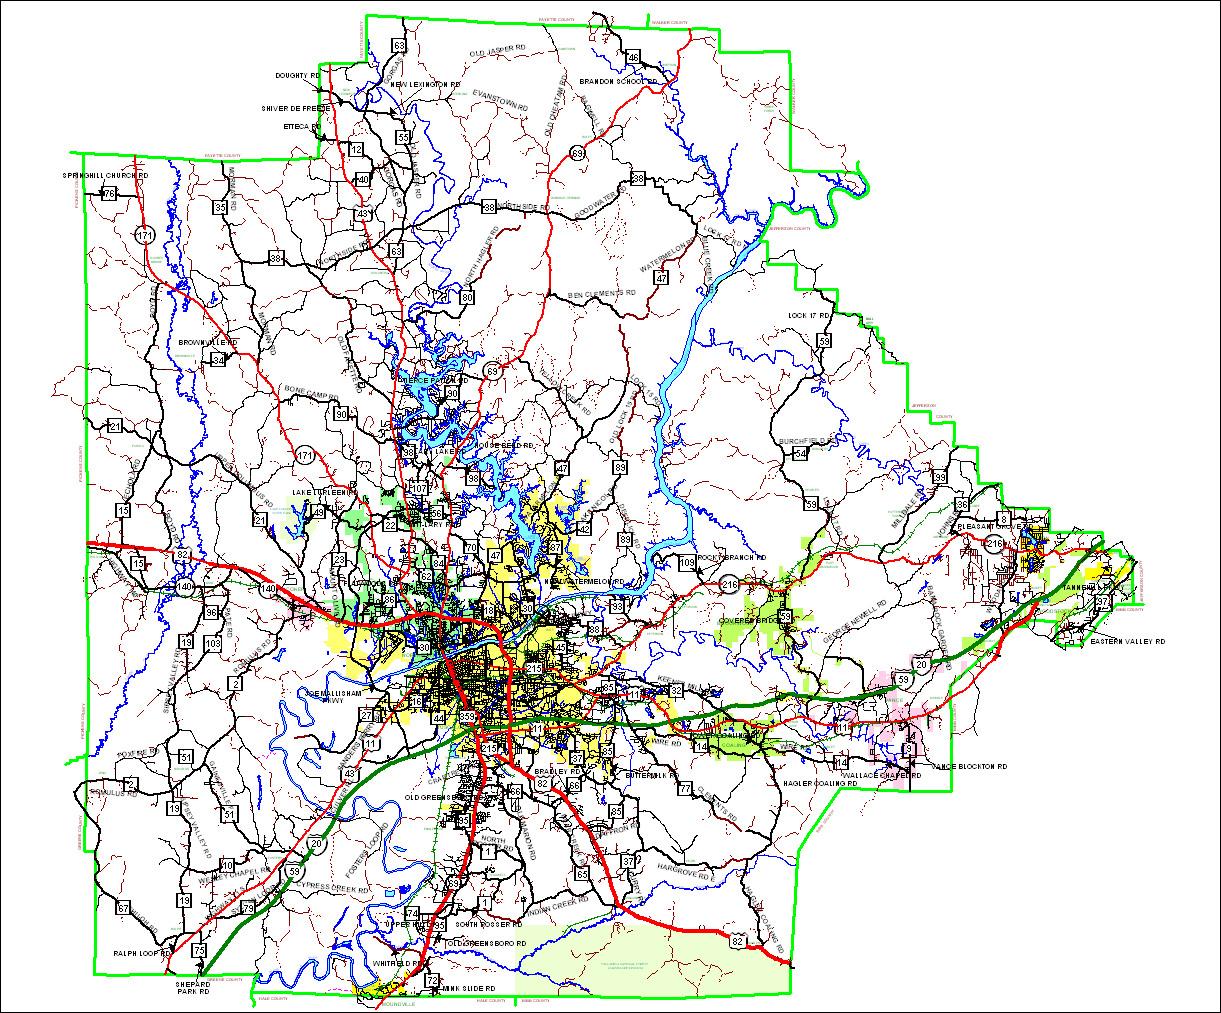 Tuscaloosa County Roads - Tuscaloosa County Alabama on